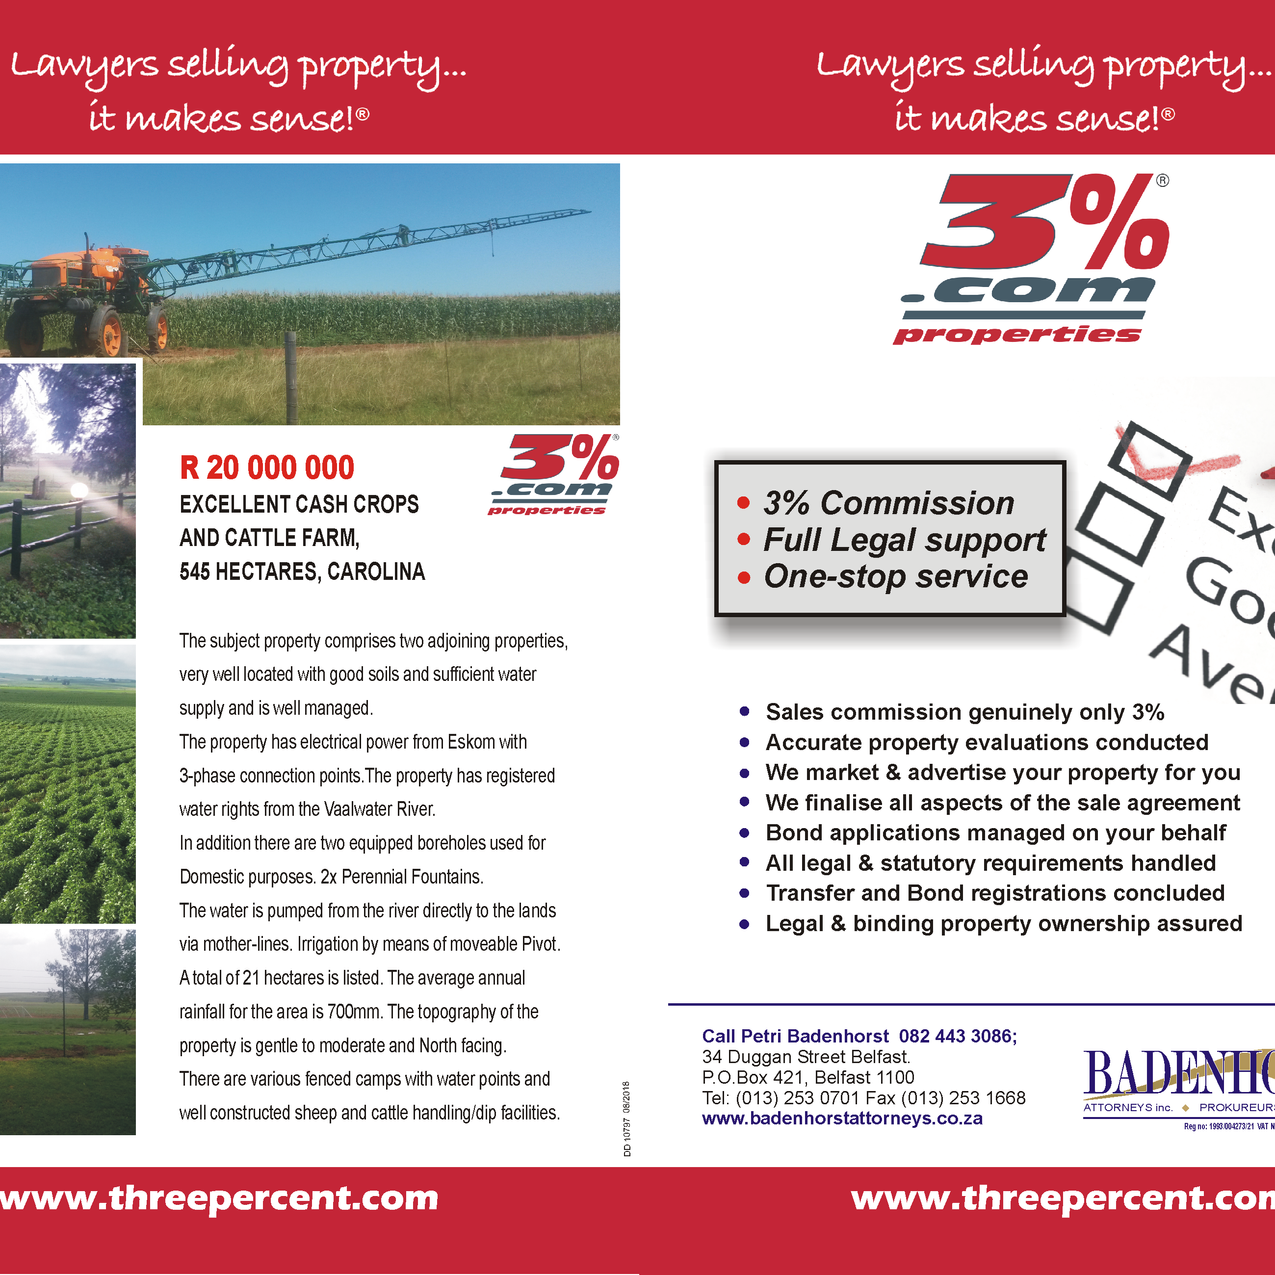 DD10797_-_A4_fold_A5_leaflet